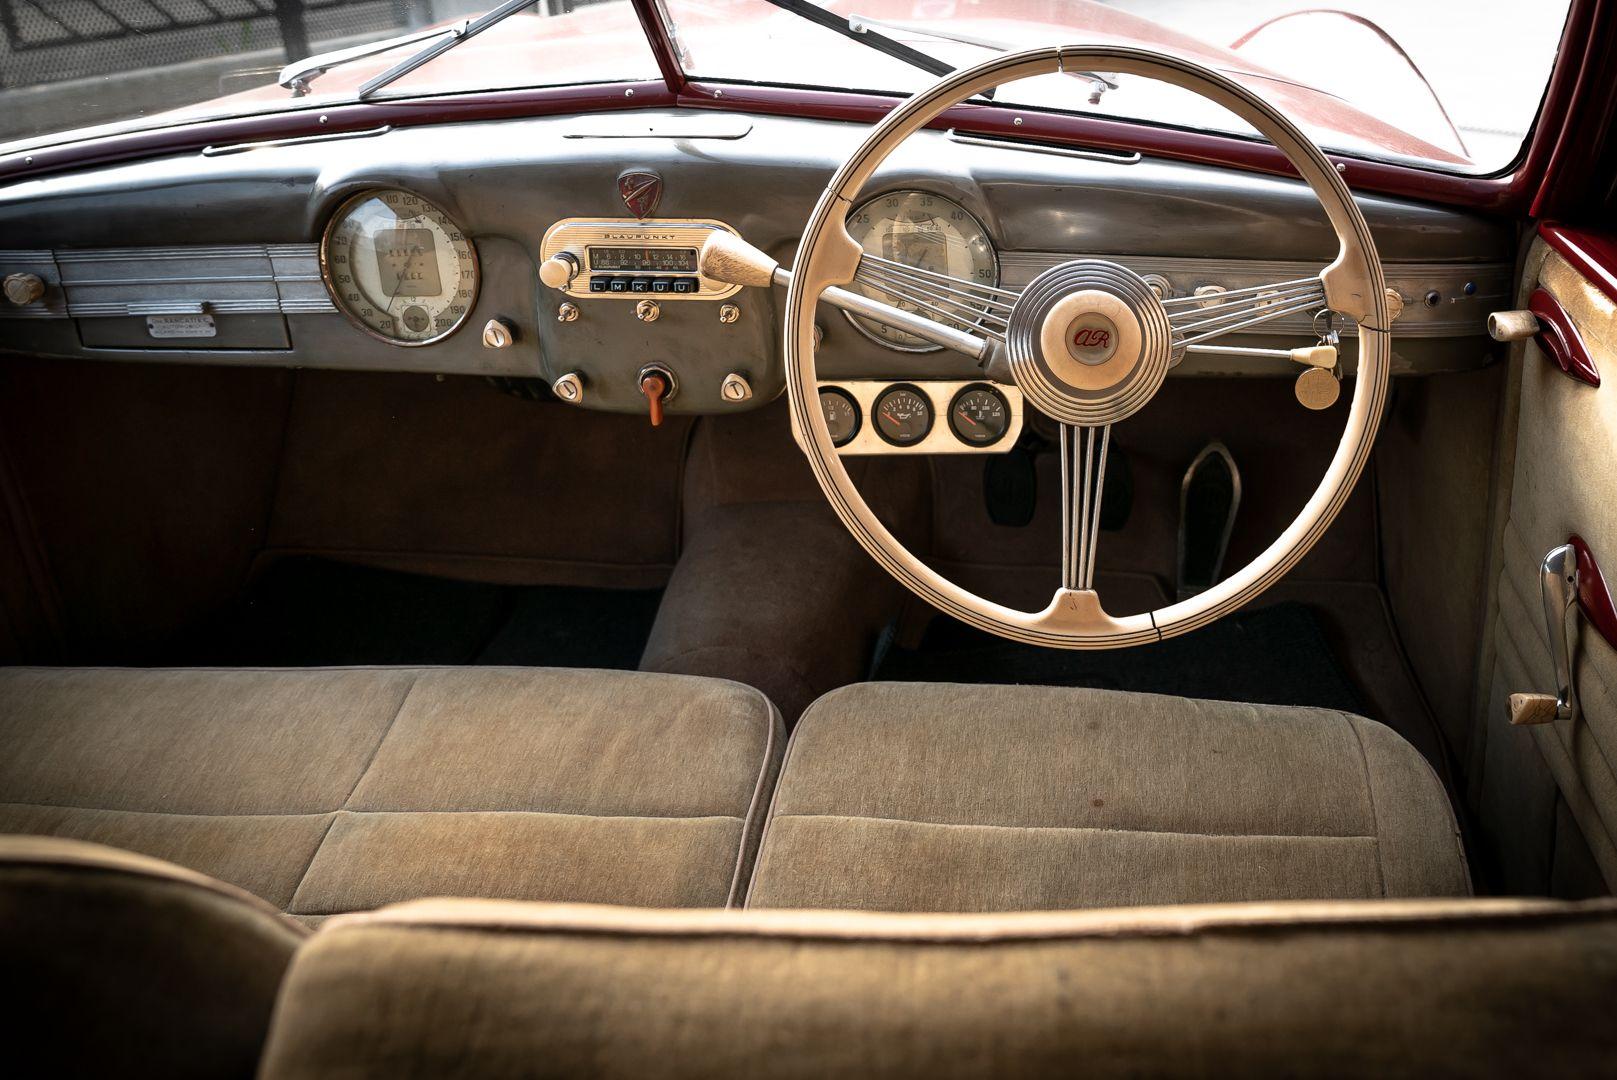 1947 Alfa Romeo Freccia d'oro 6C 2500 Sport 61739